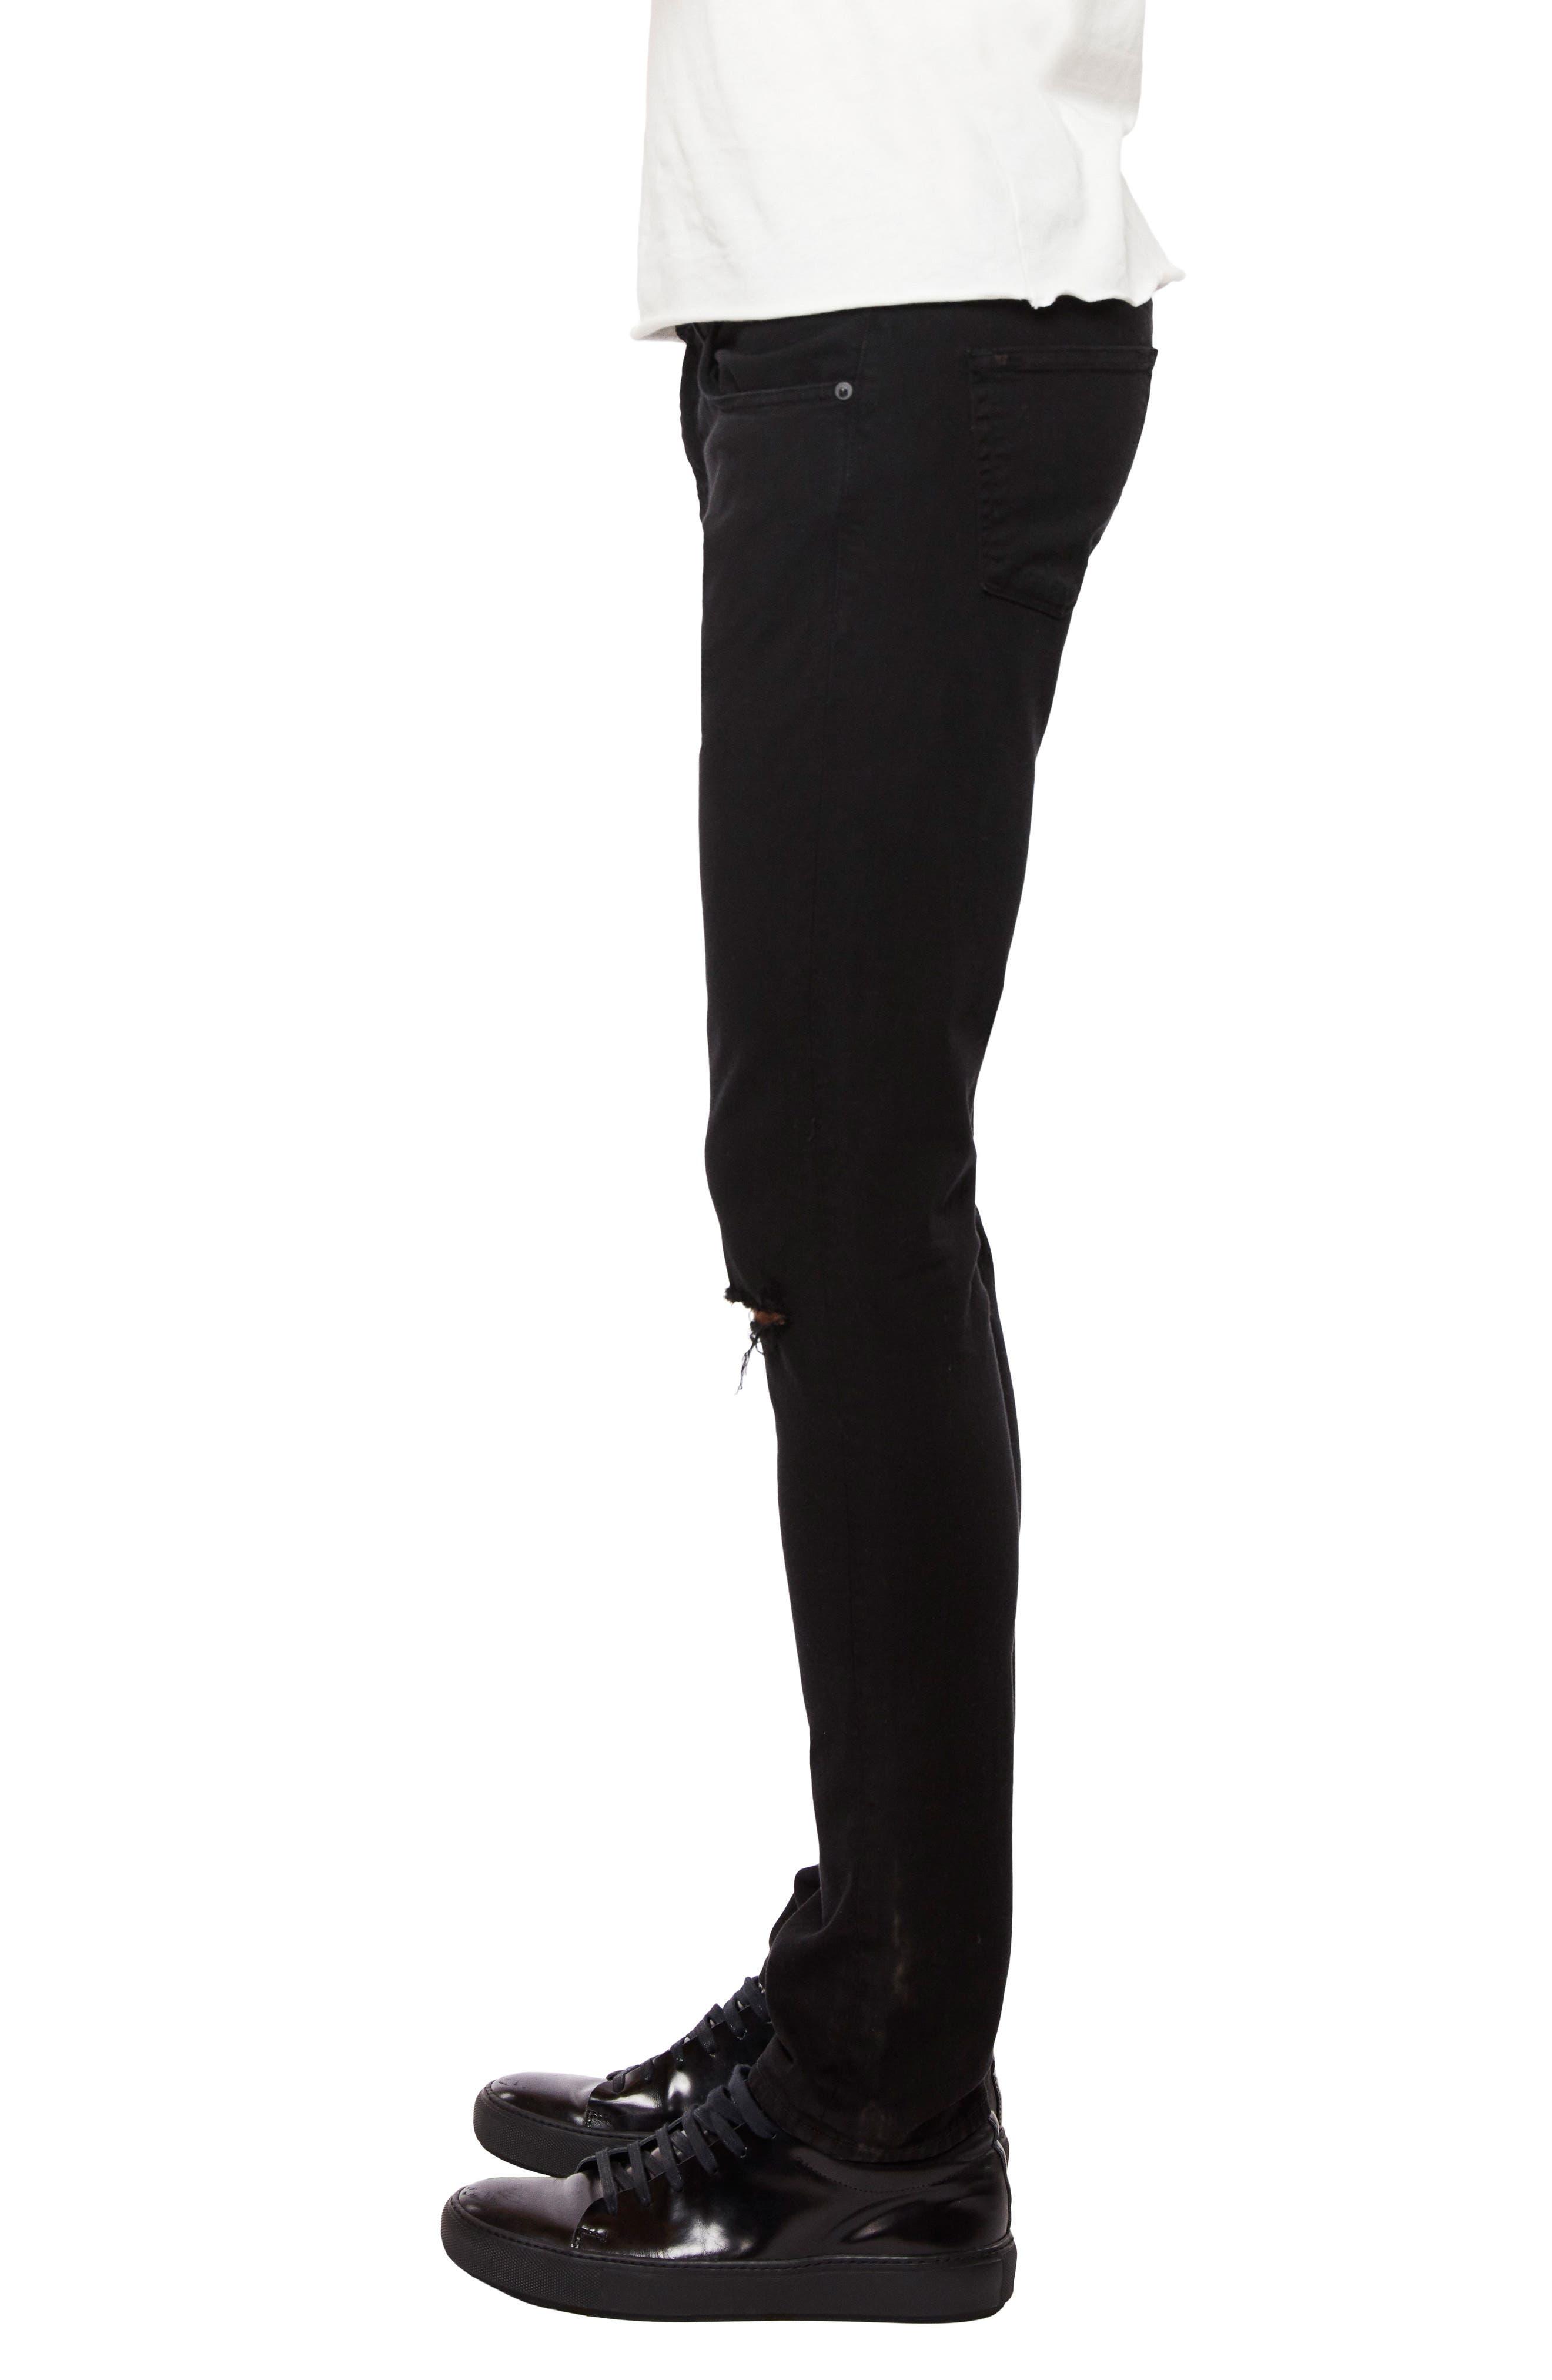 Mick Skinny Fit Jeans,                             Alternate thumbnail 3, color,                             LINCOLN OAK